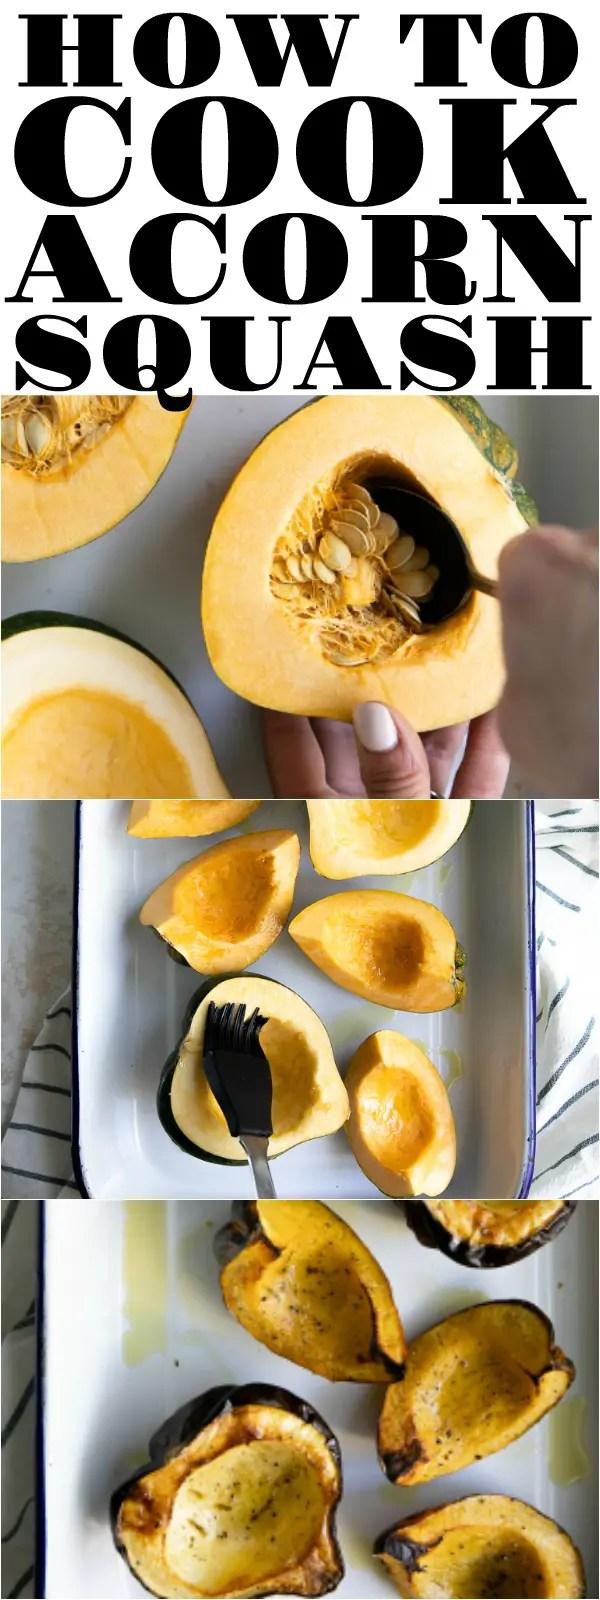 How to Roast an Acorn Squash #acornsquash #squash #howtocookacornsquash #bakedsquash #vegetarian #easyrecipe   For this recipe and more visit, https://theforkedspoon.com